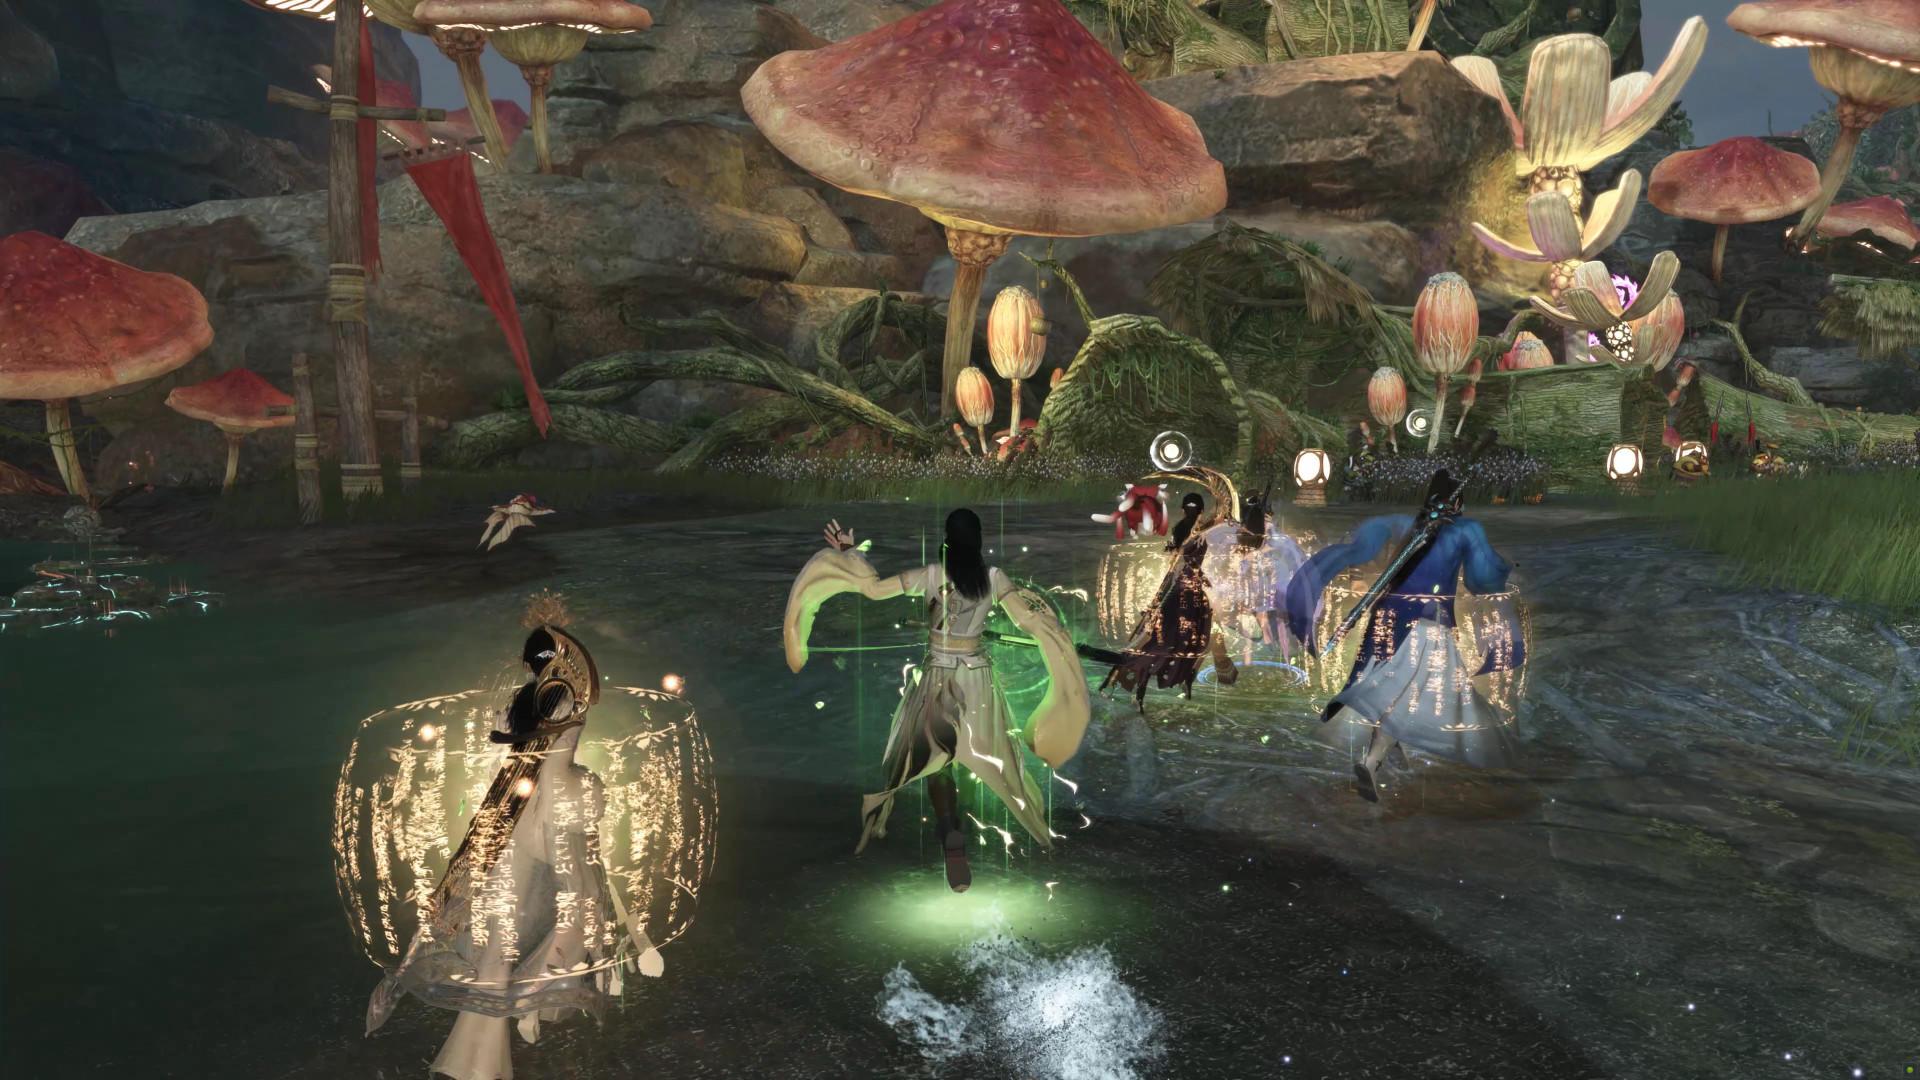 swords-of-legends-online-review-04-part-2